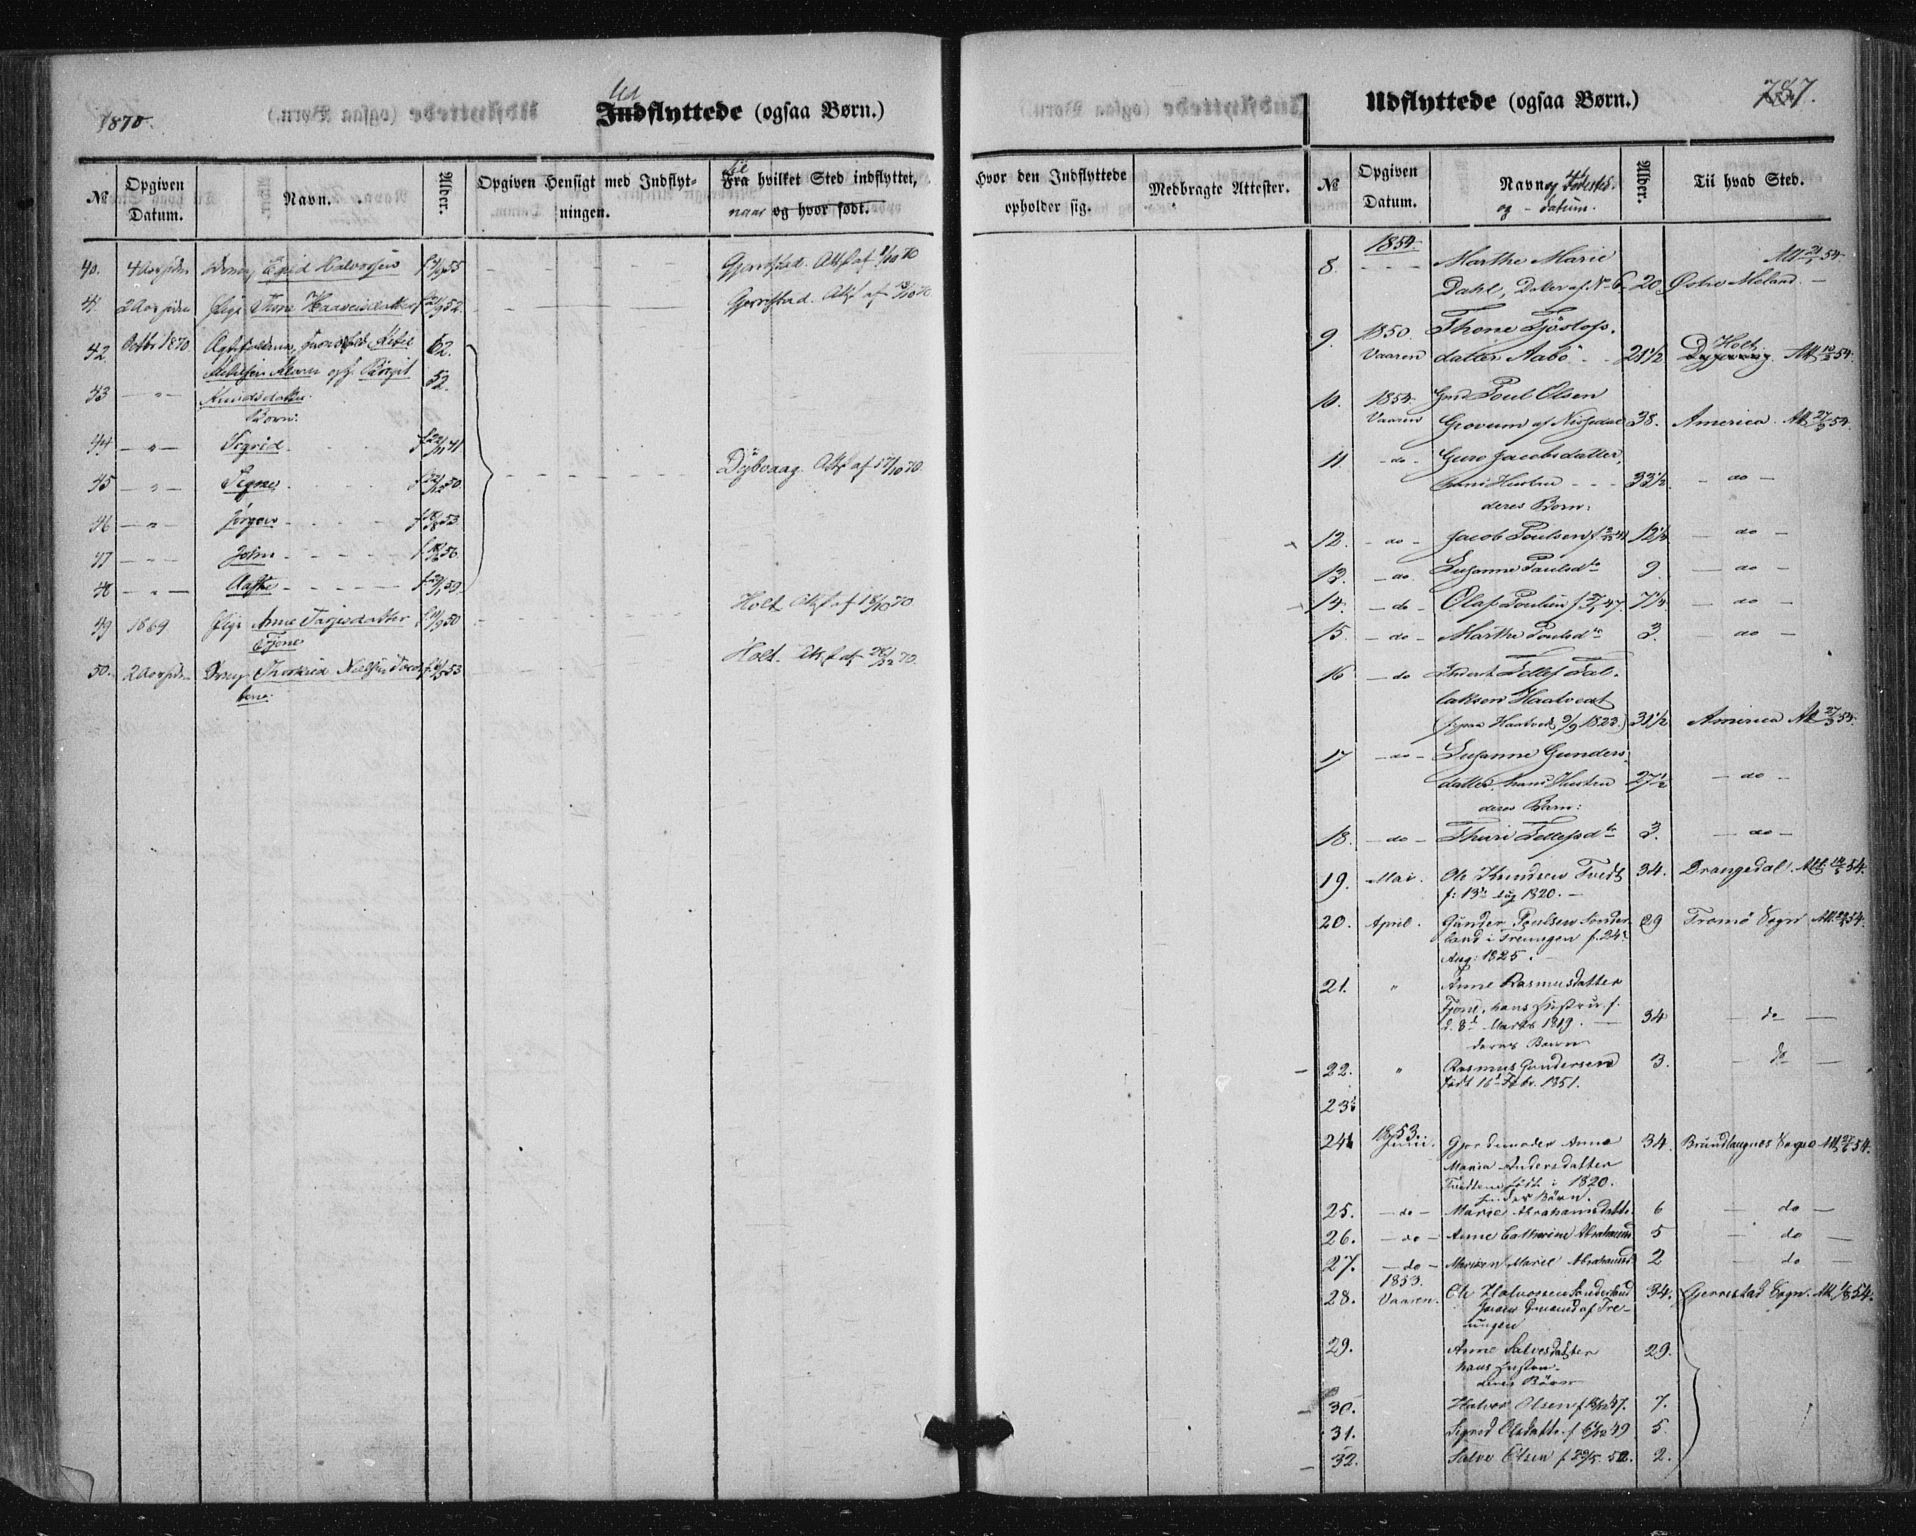 SAKO, Nissedal kirkebøker, F/Fa/L0003: Ministerialbok nr. I 3, 1846-1870, s. 786-787